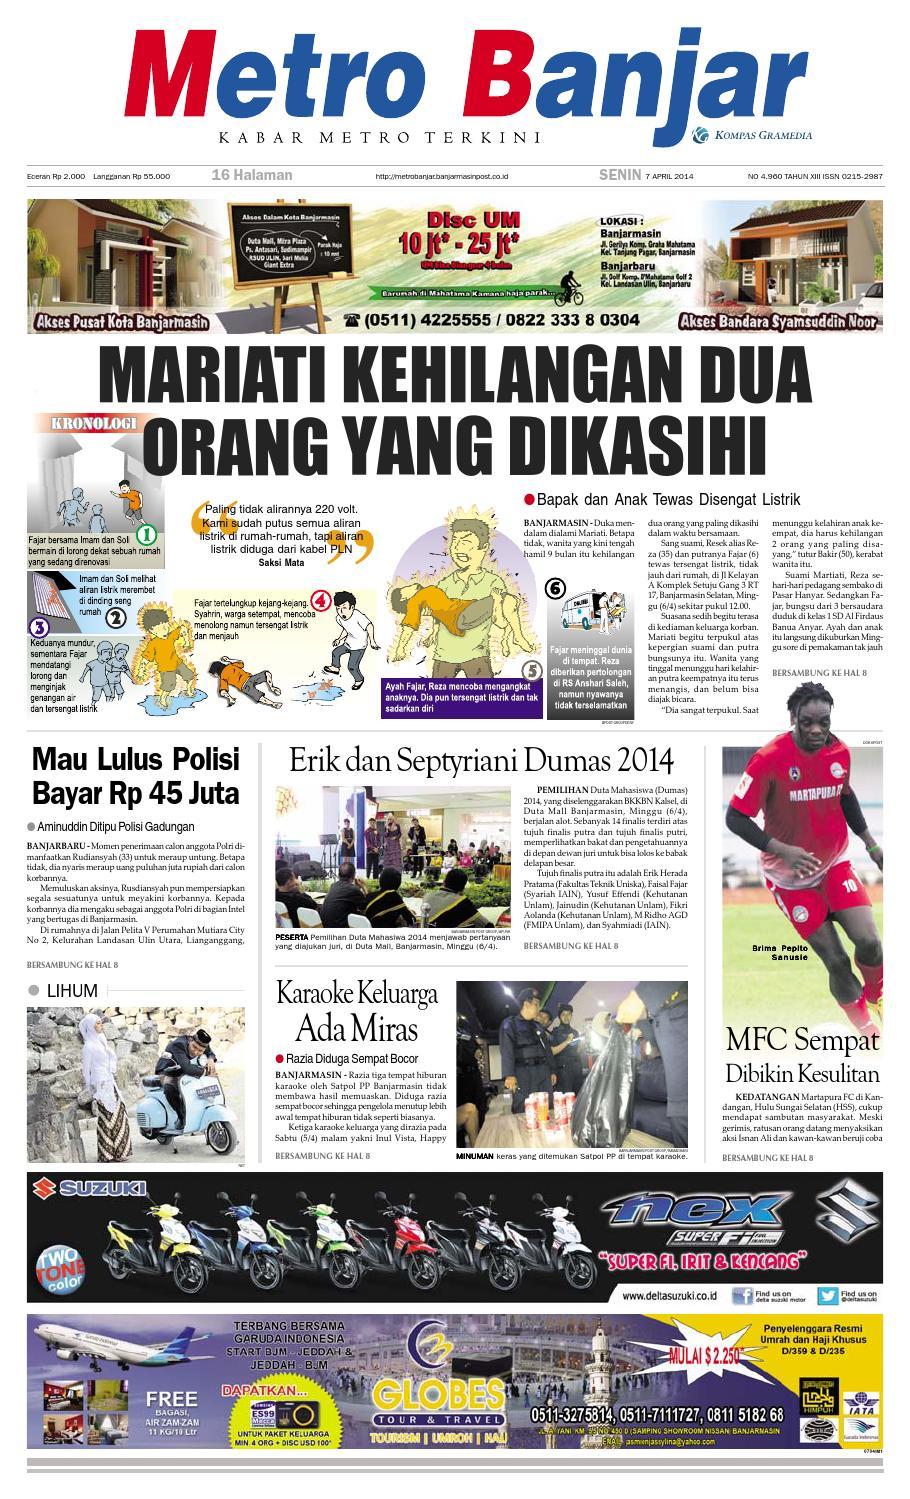 Metro Banjar Senin 7 April 2014 by Harian Metro Banjar - issuu 53f64da115